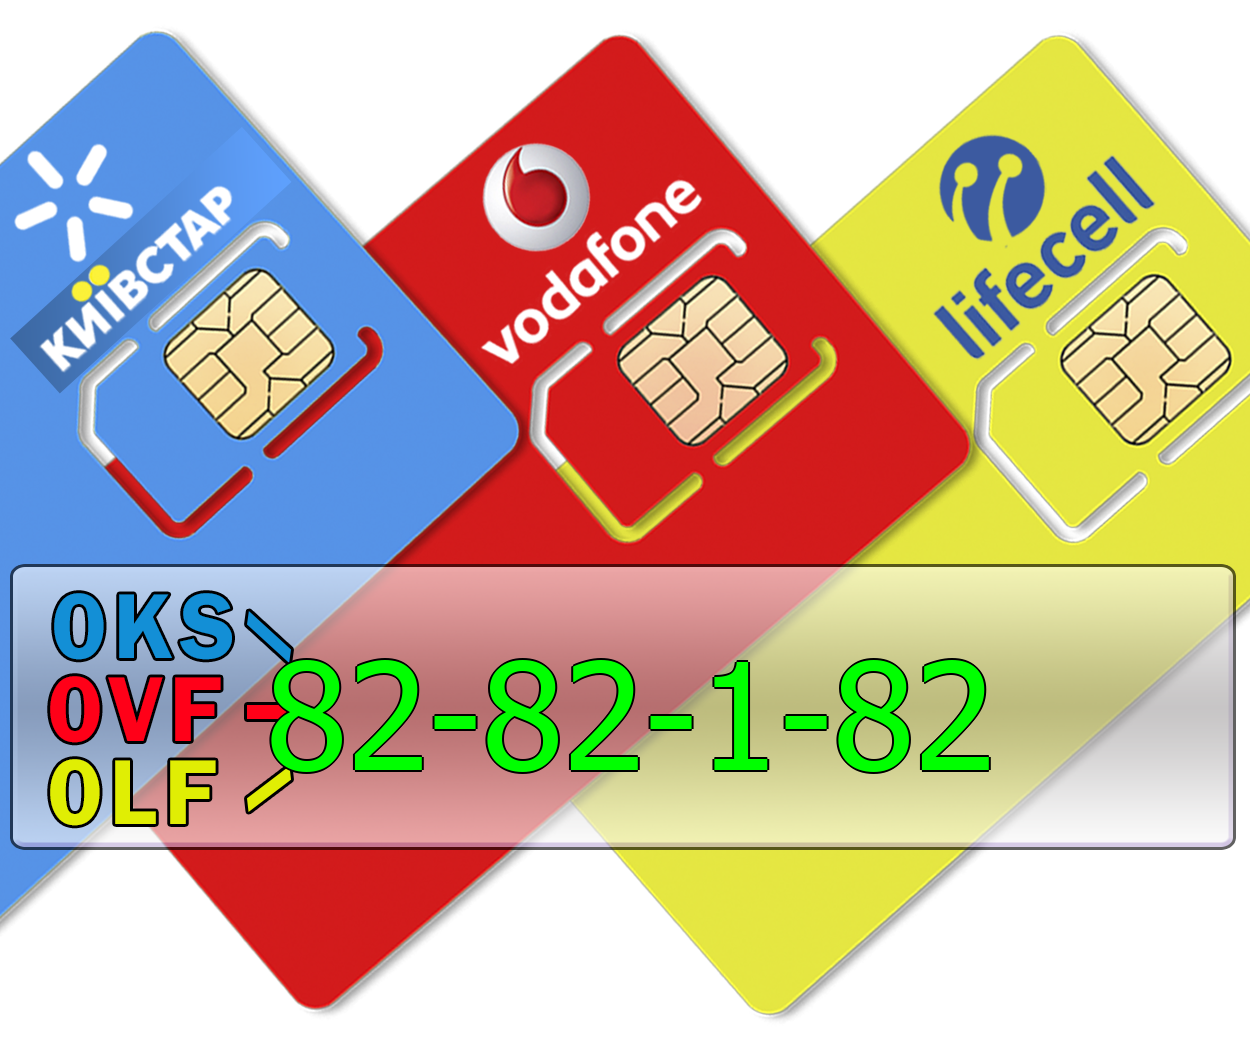 Трио 0KS-82-82-1-82 0LF-82-82-1-82 0VF-82-82-1-82 Киевстар, lifecell, Vodafone